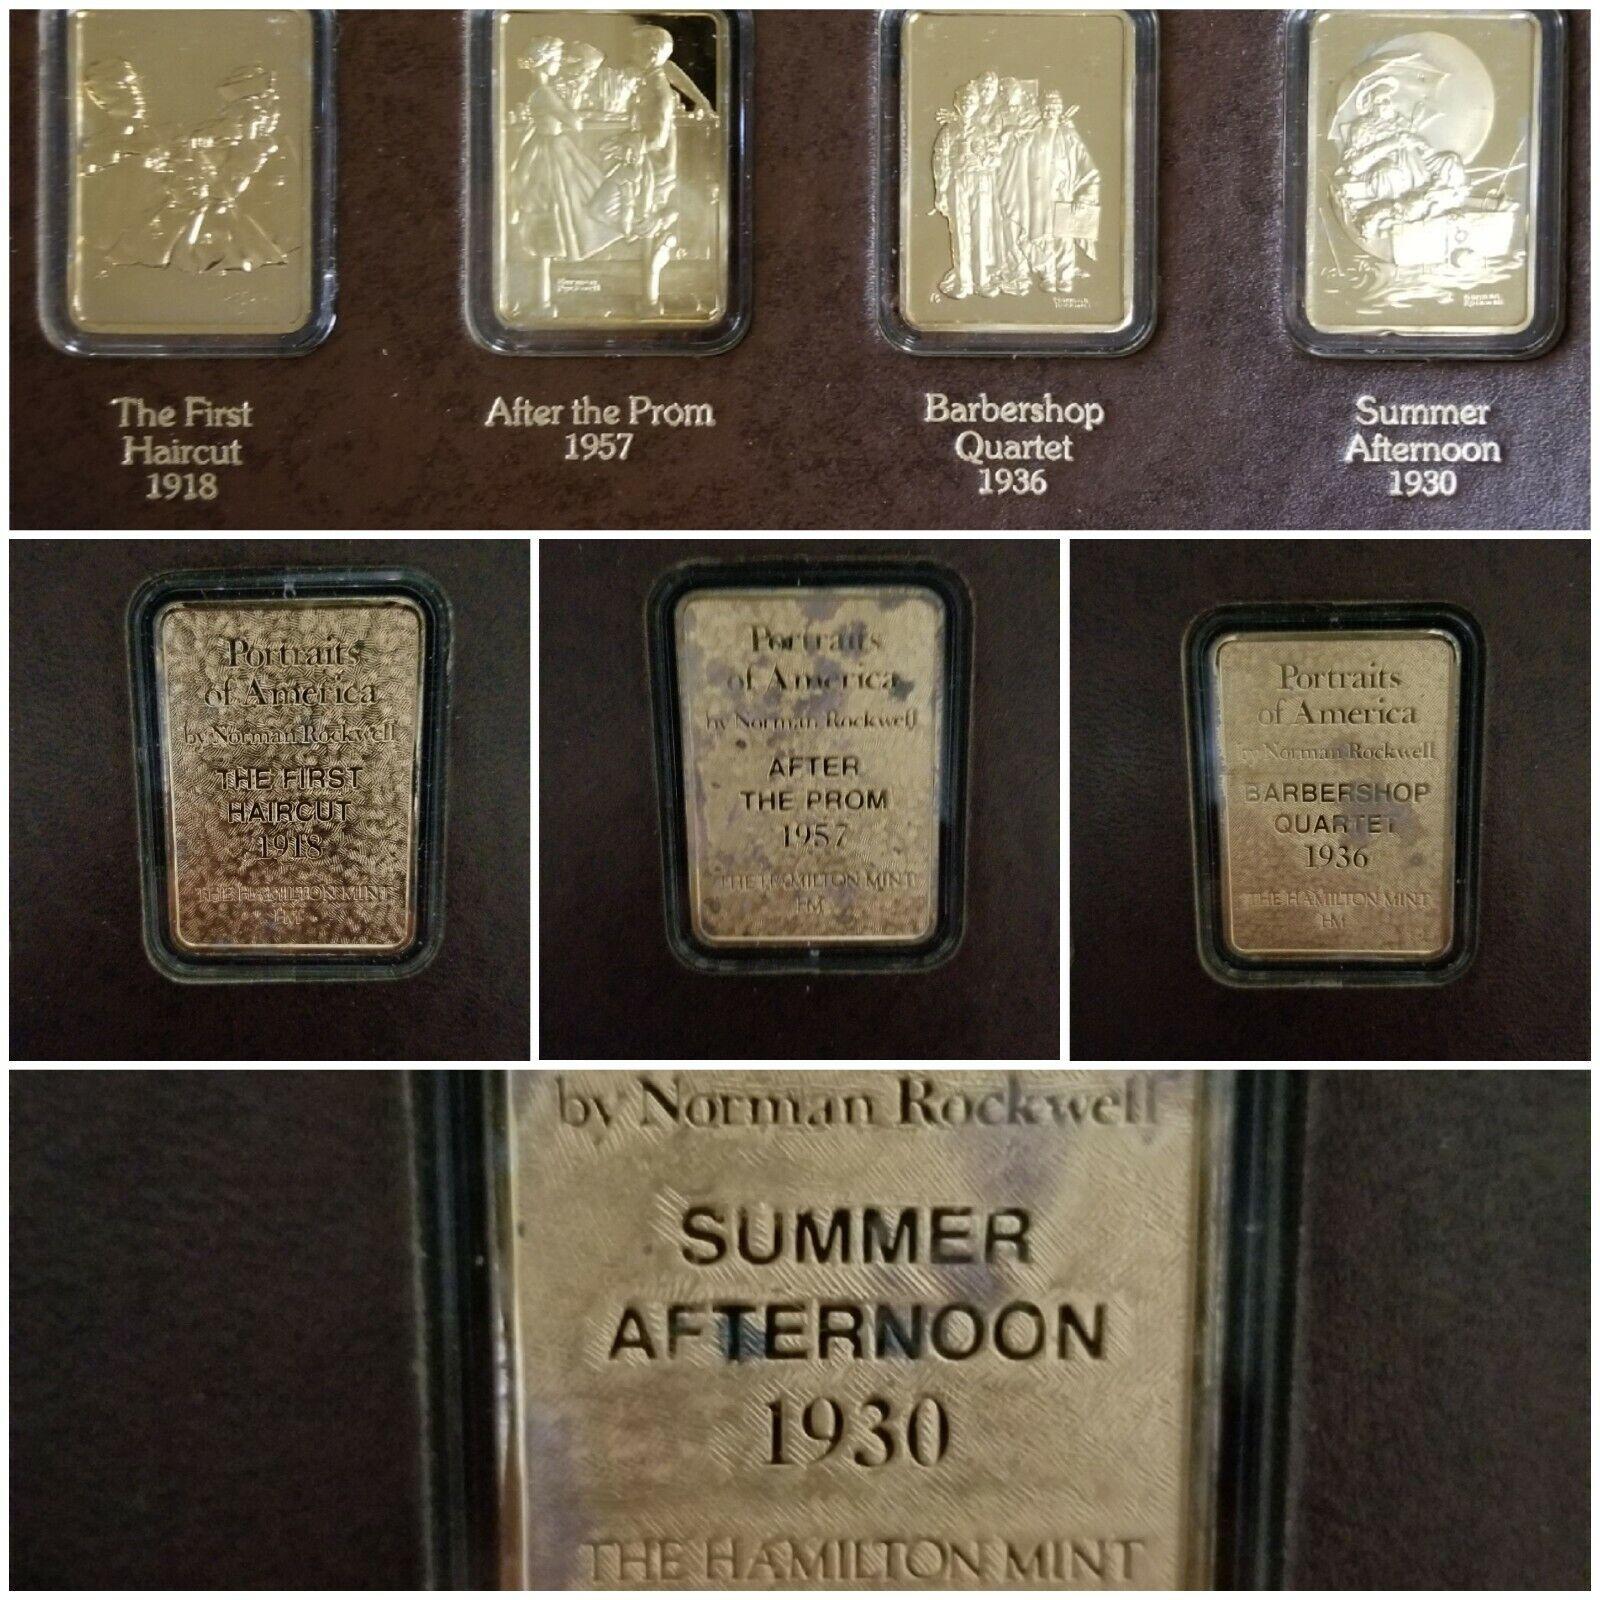 24 Troy Oz .999 Fine 24 EGP Silver Bars/Rounds, Hamilton Mint, Error Date  - $1,250.00